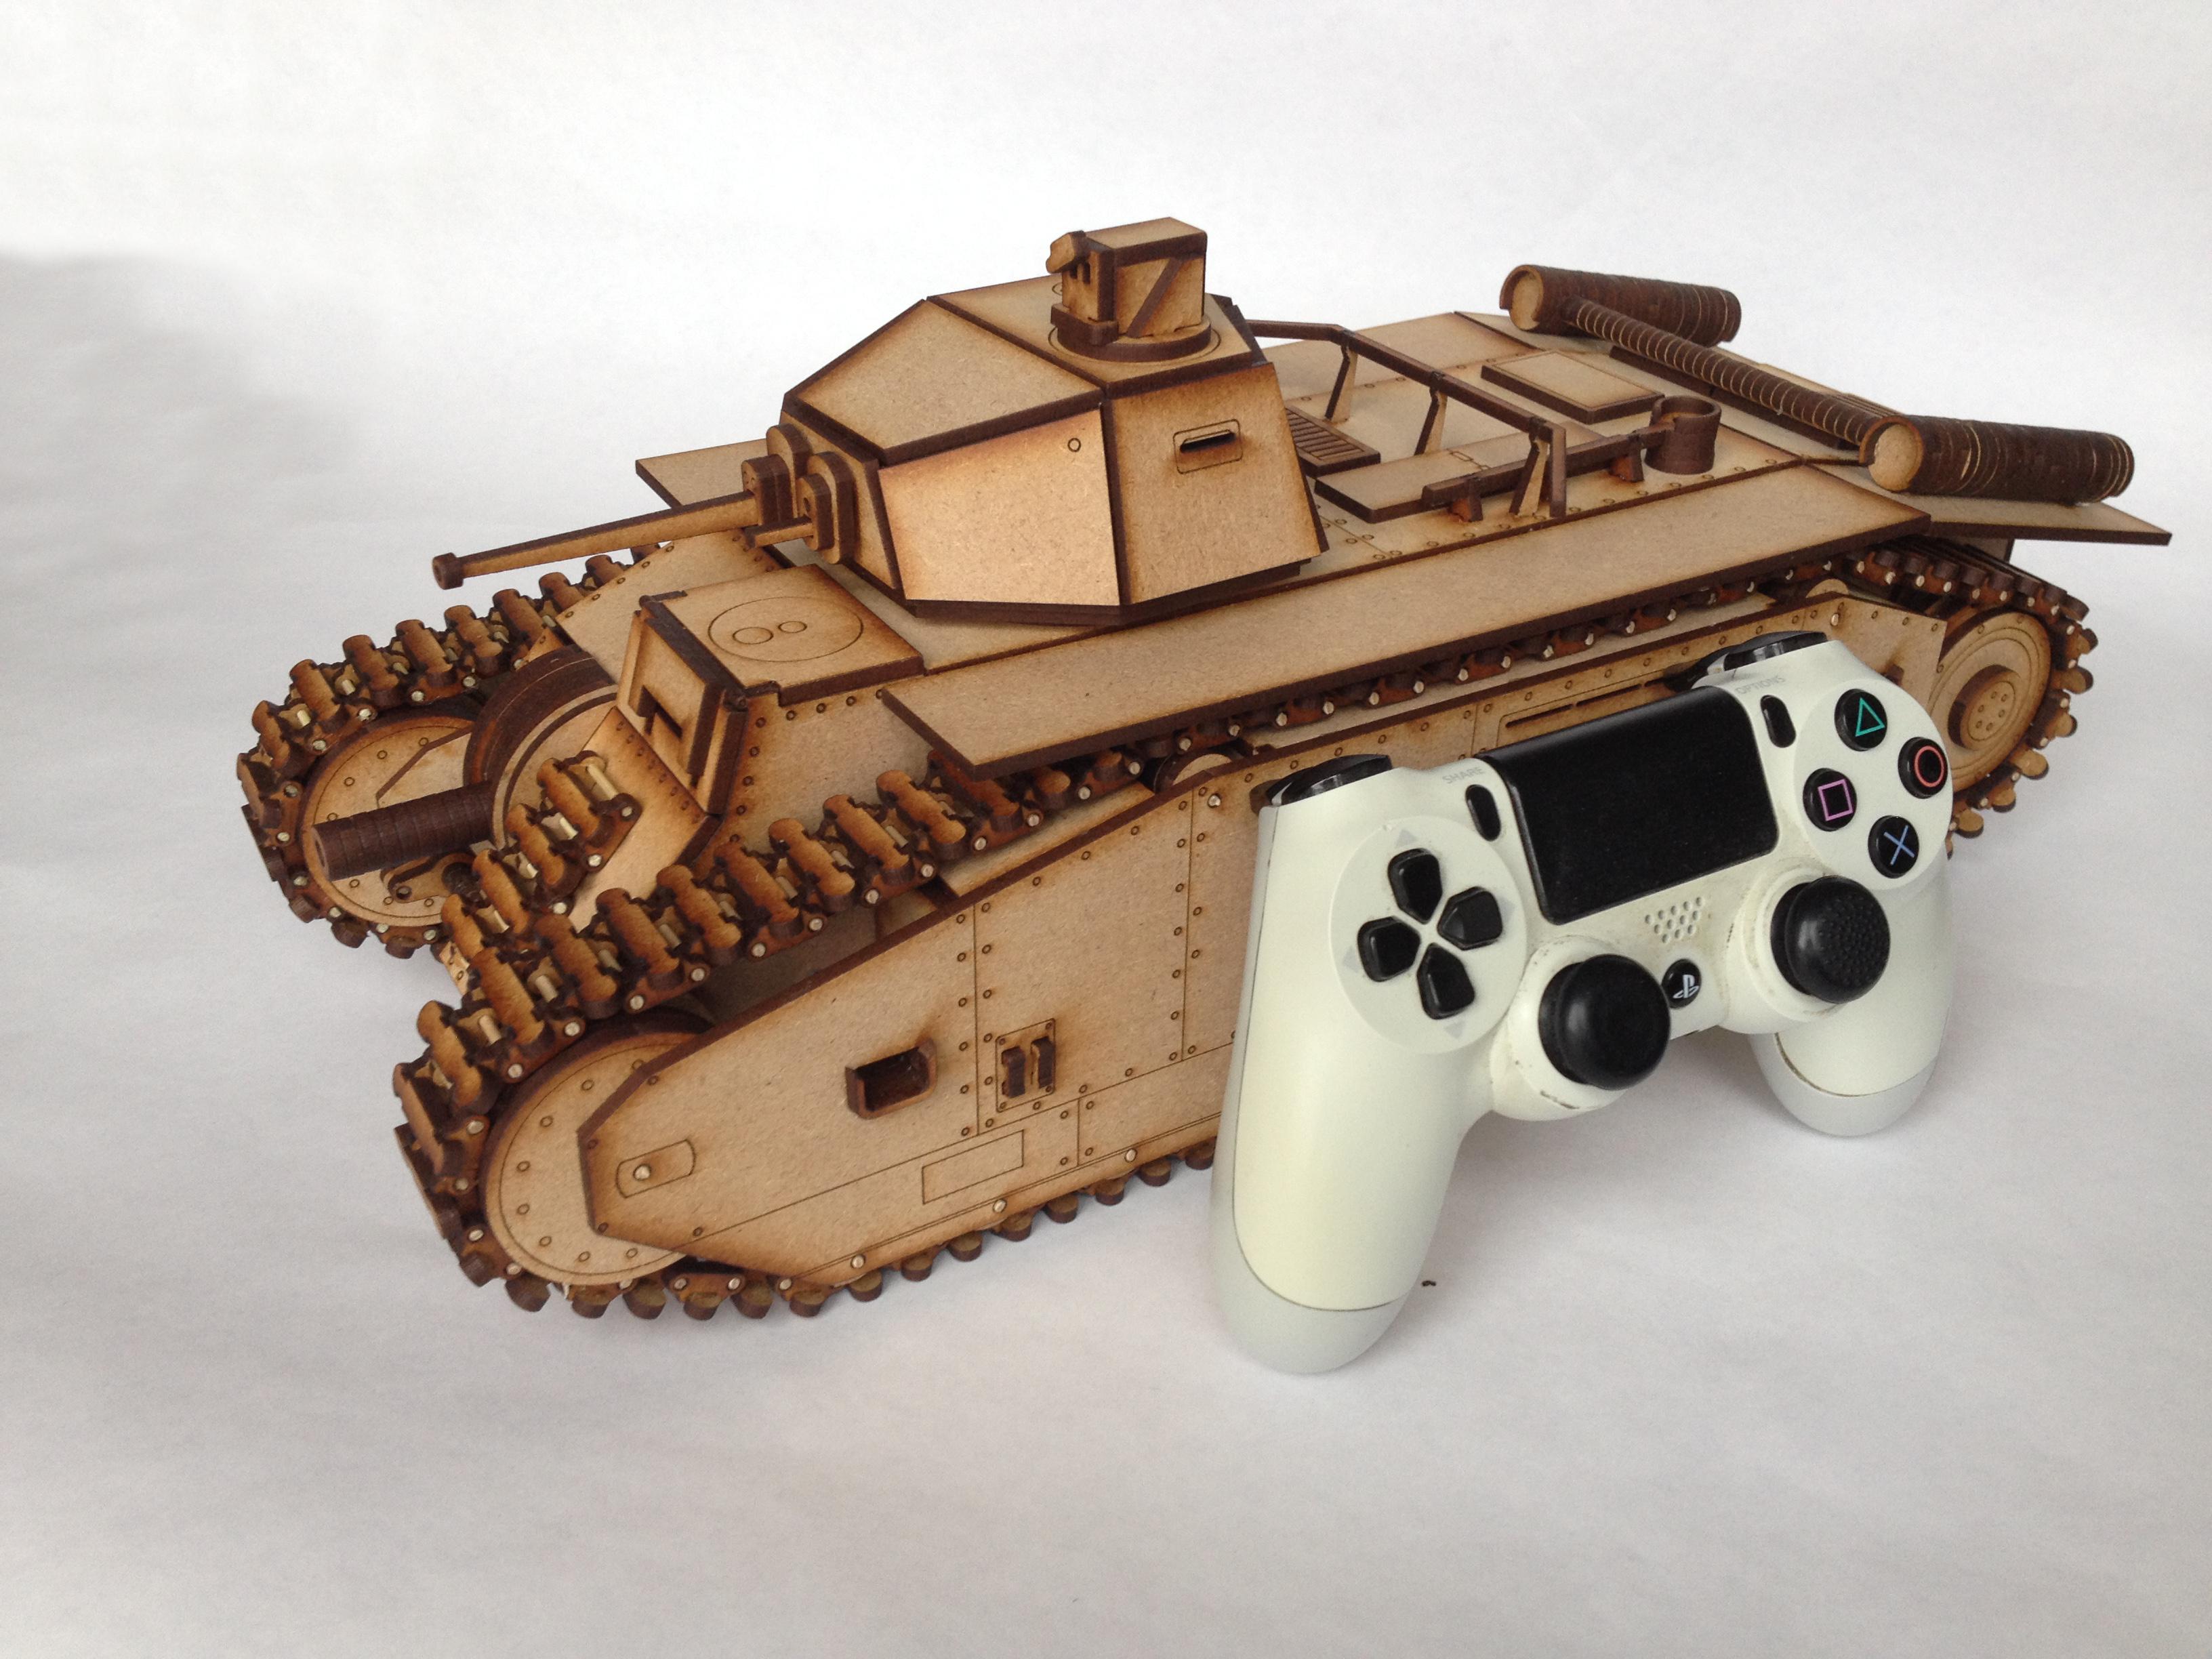 Picture of Carter's Lasercut Tank - B1 Bis